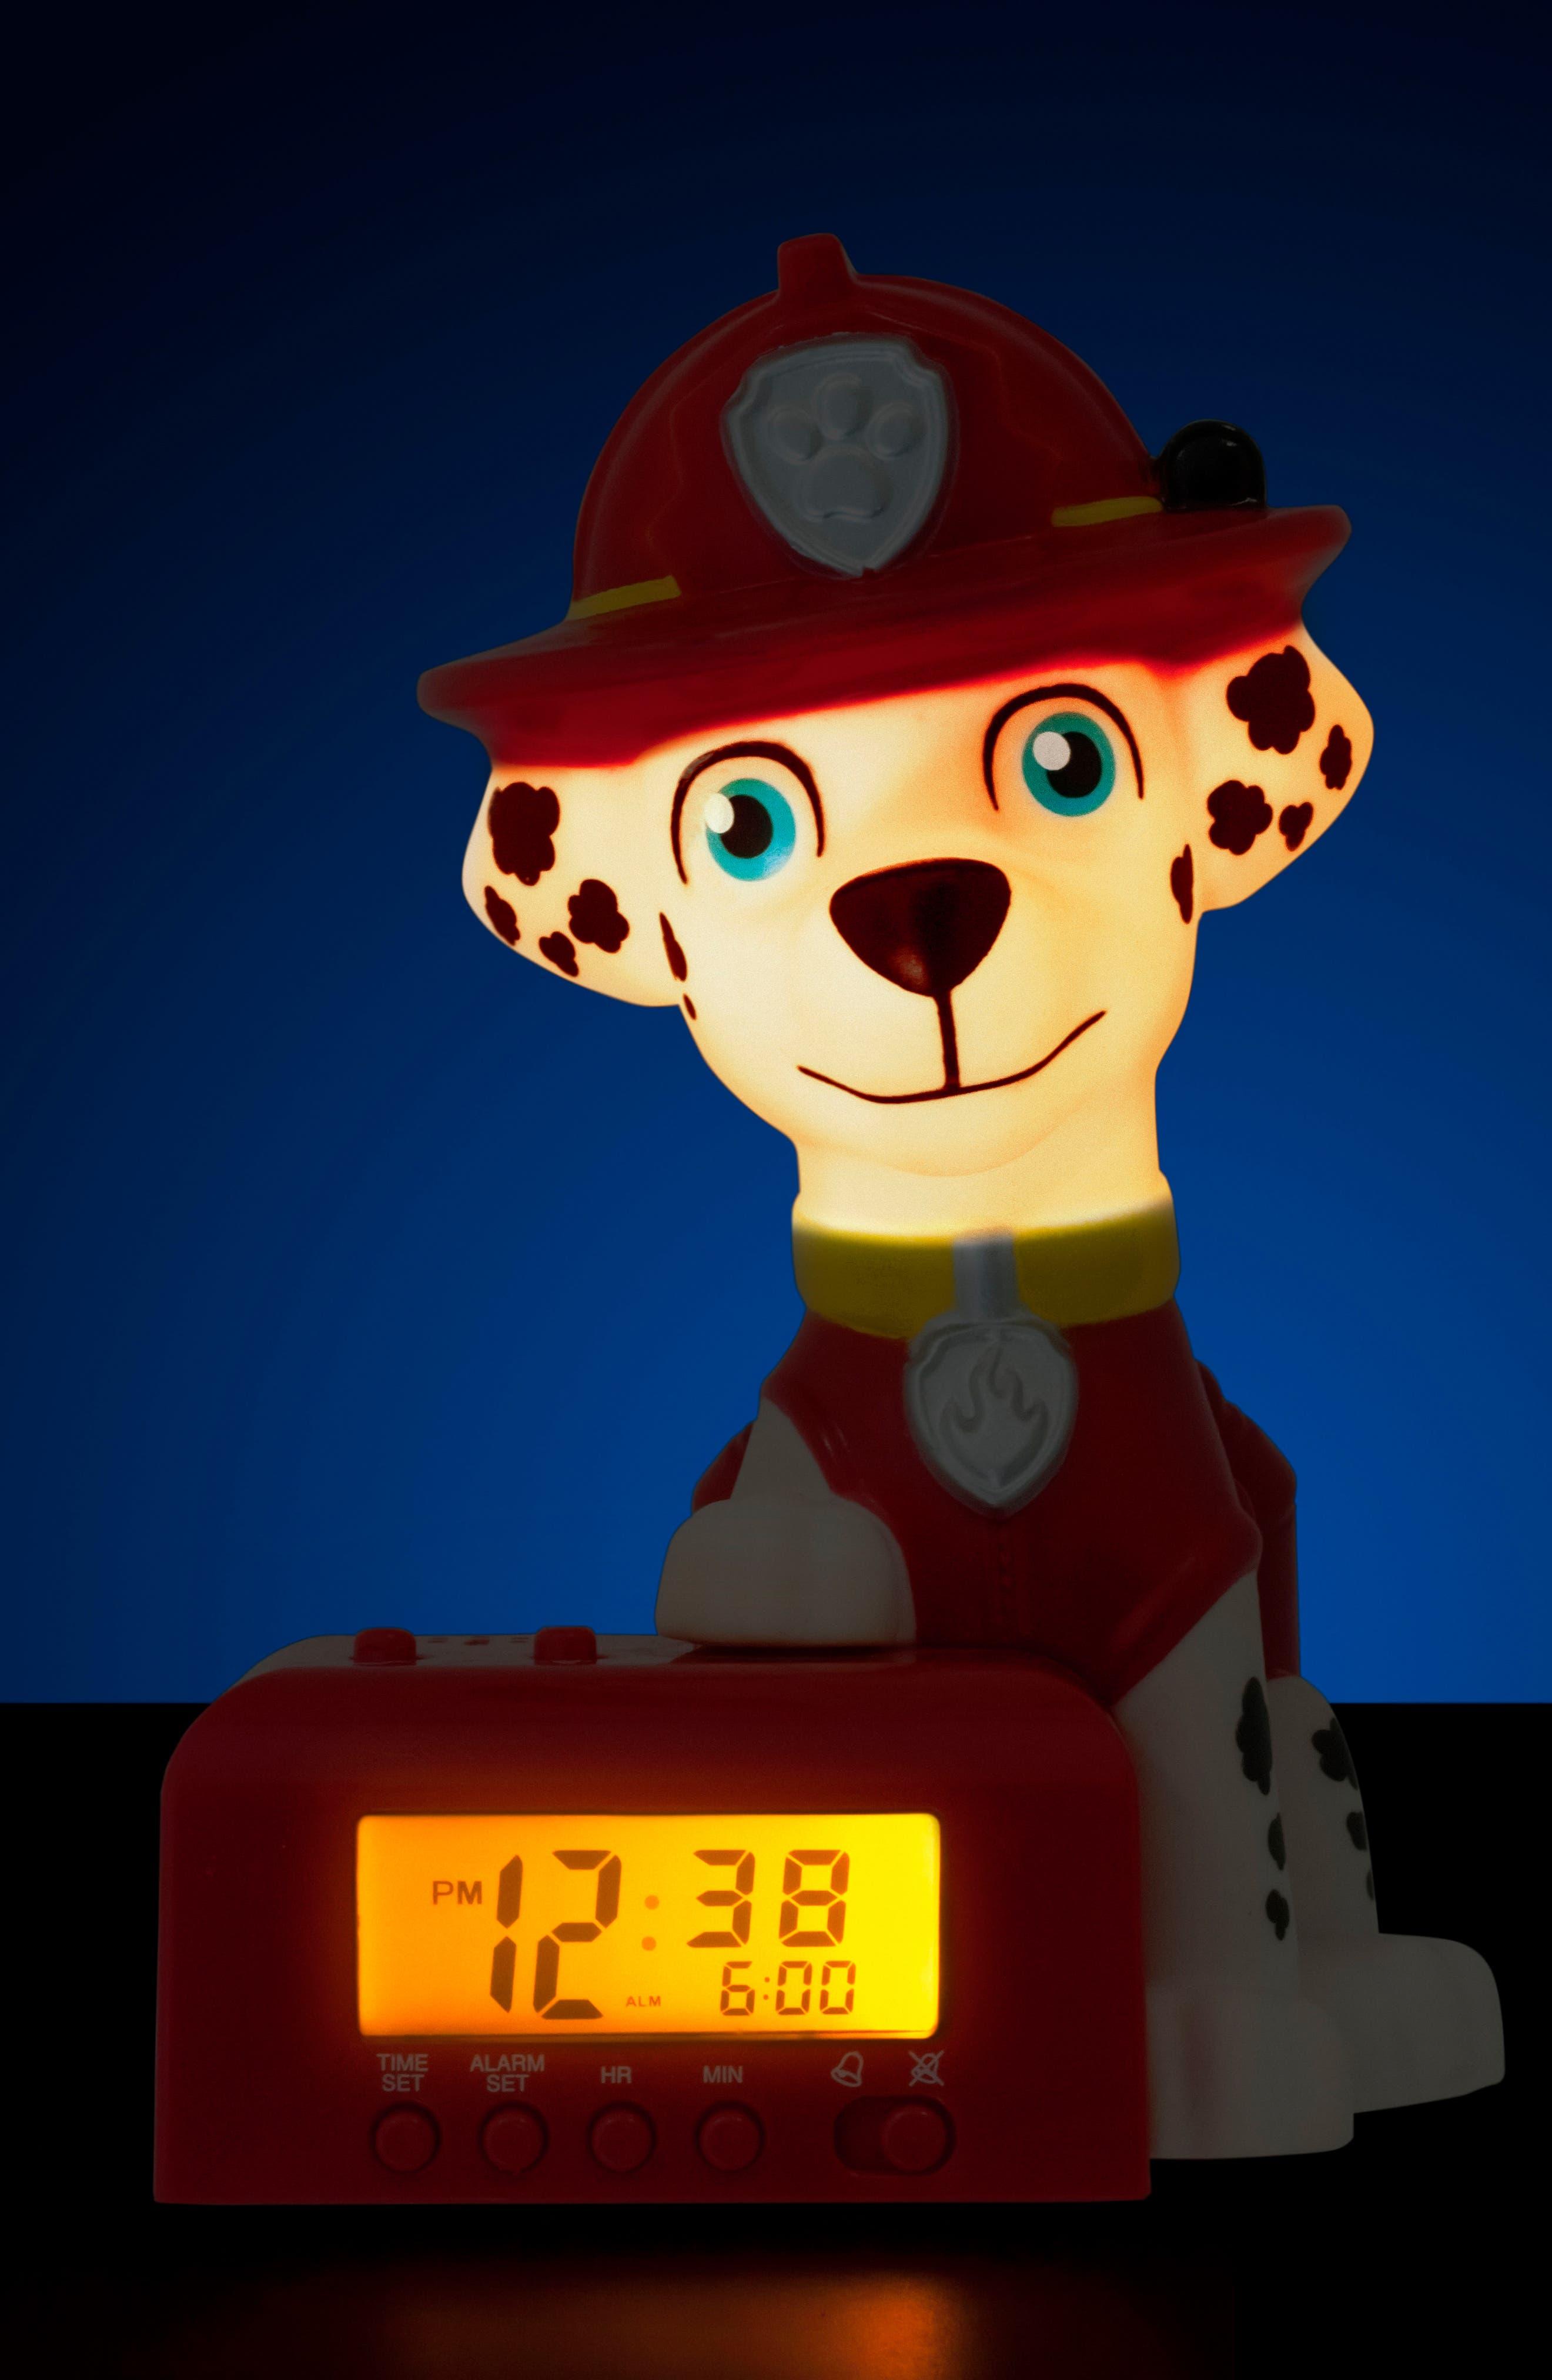 Paw Patrol - Marshall Night-Light/Alarm Clock,                             Alternate thumbnail 3, color,                             400